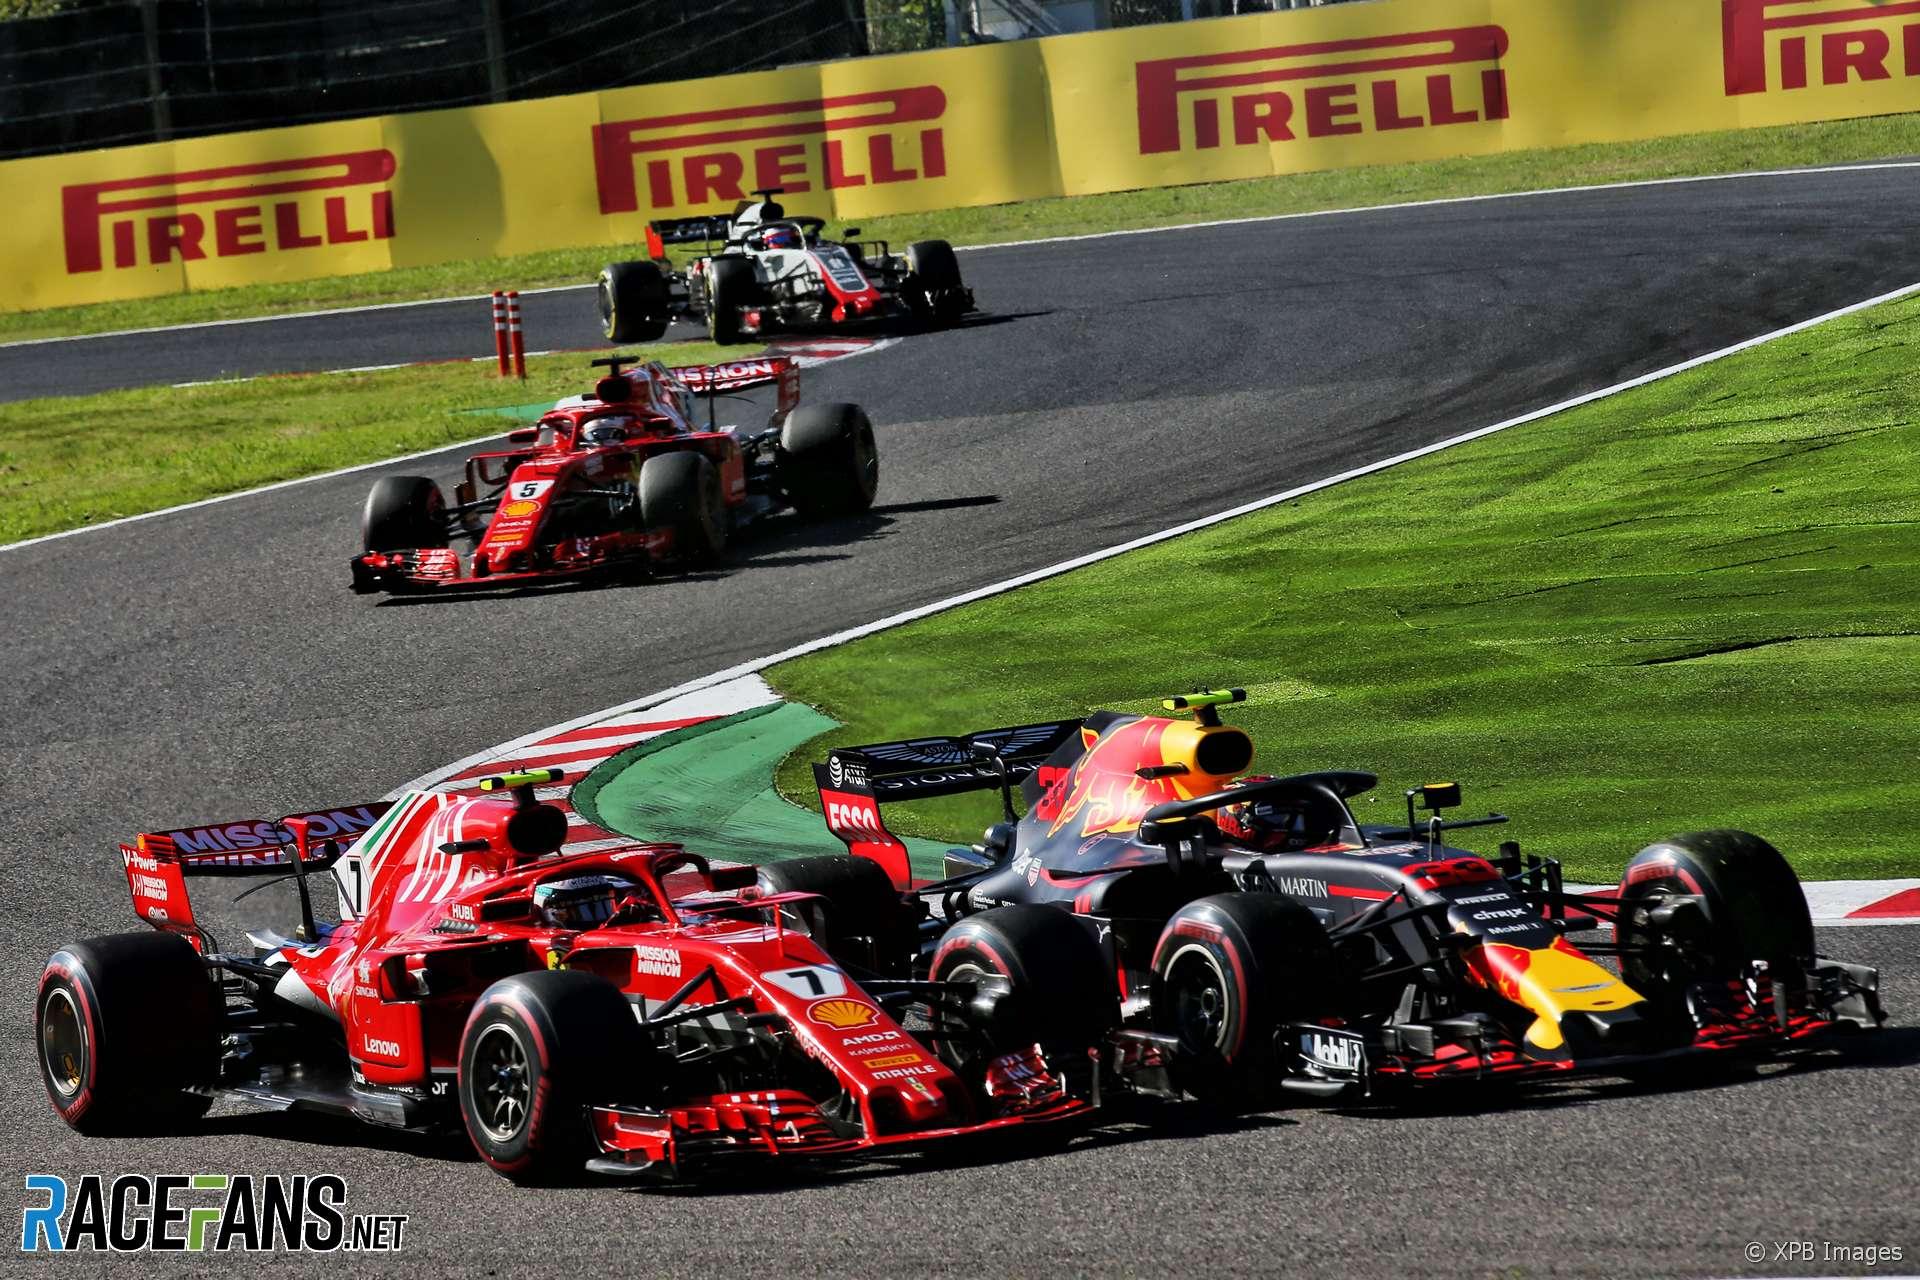 Max Verstappen, Red Bull, Suzuka, 2018